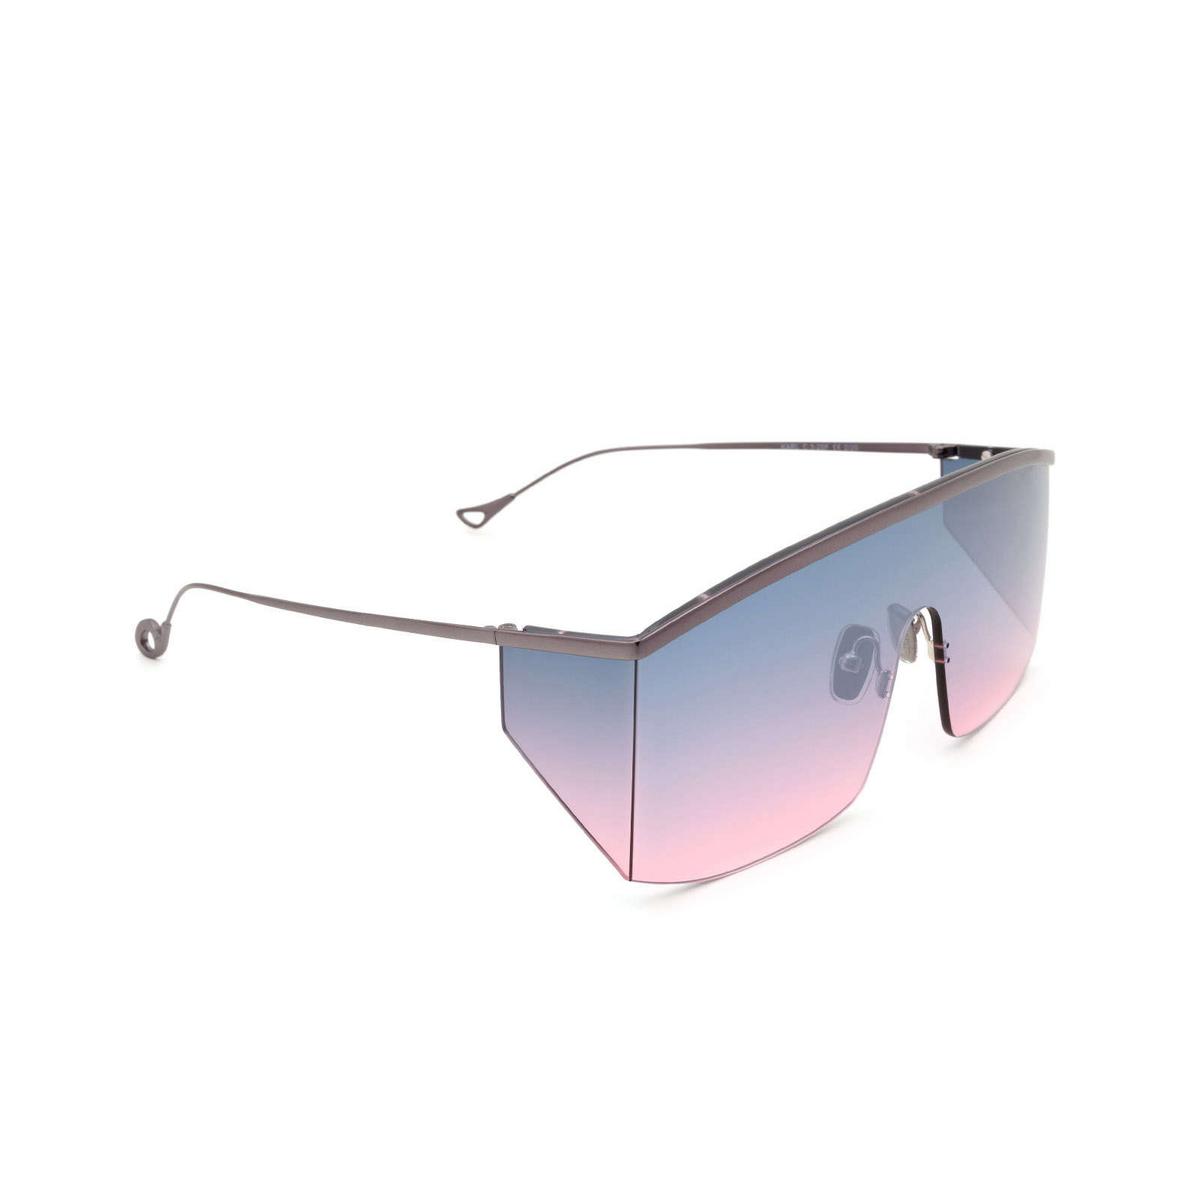 Eyepetizer® Mask Sunglasses: Karl color Gunmetal C.3-20F - three-quarters view.